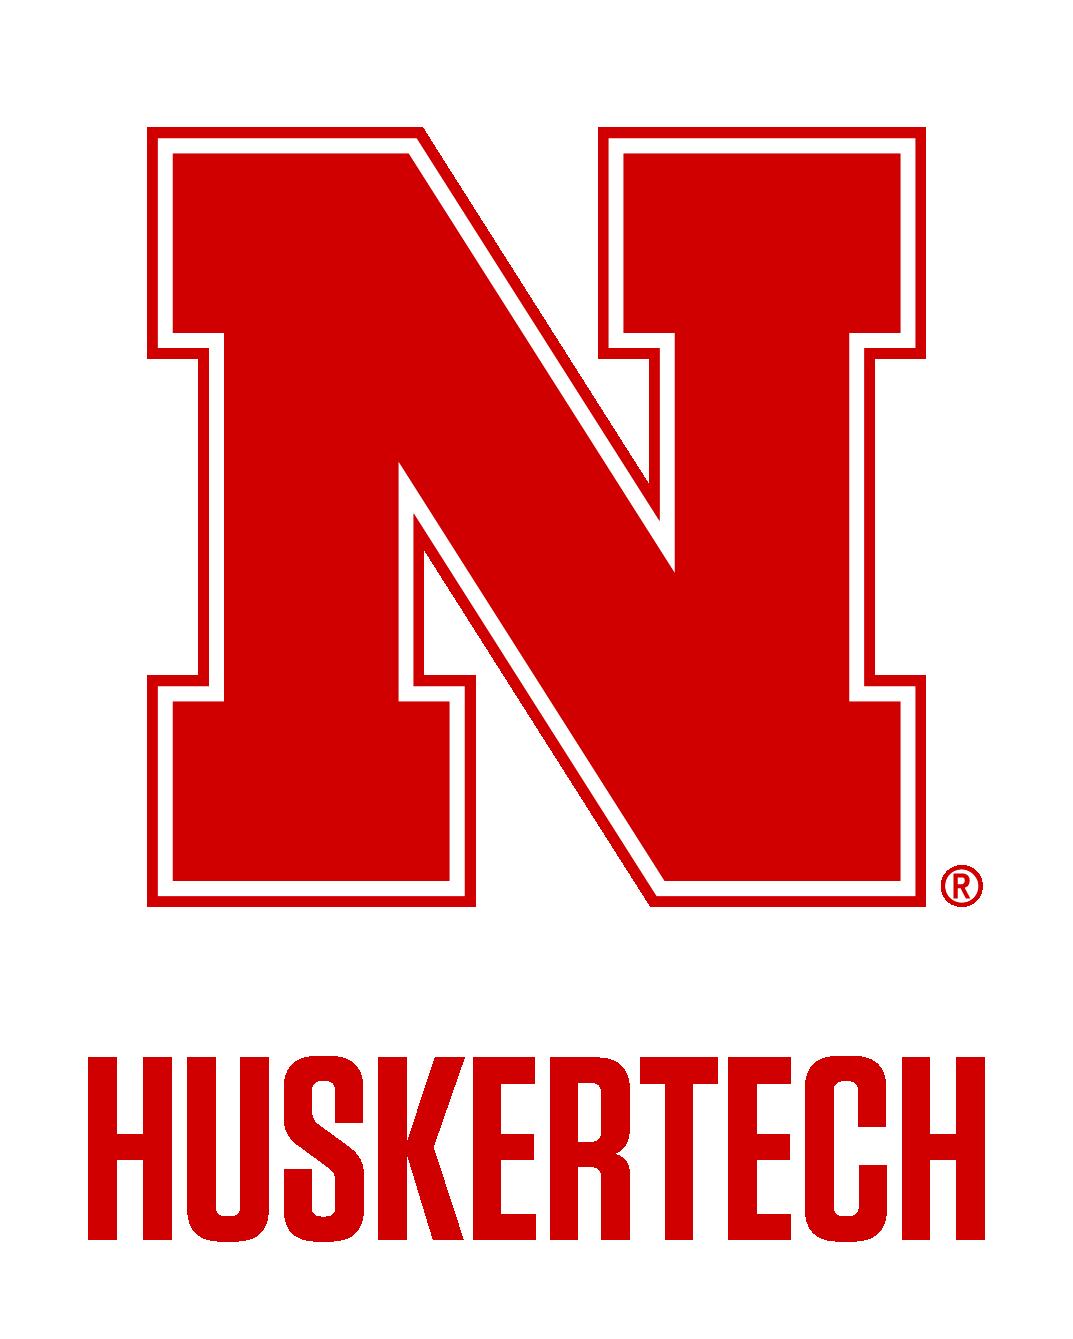 Huskertech logo lockup